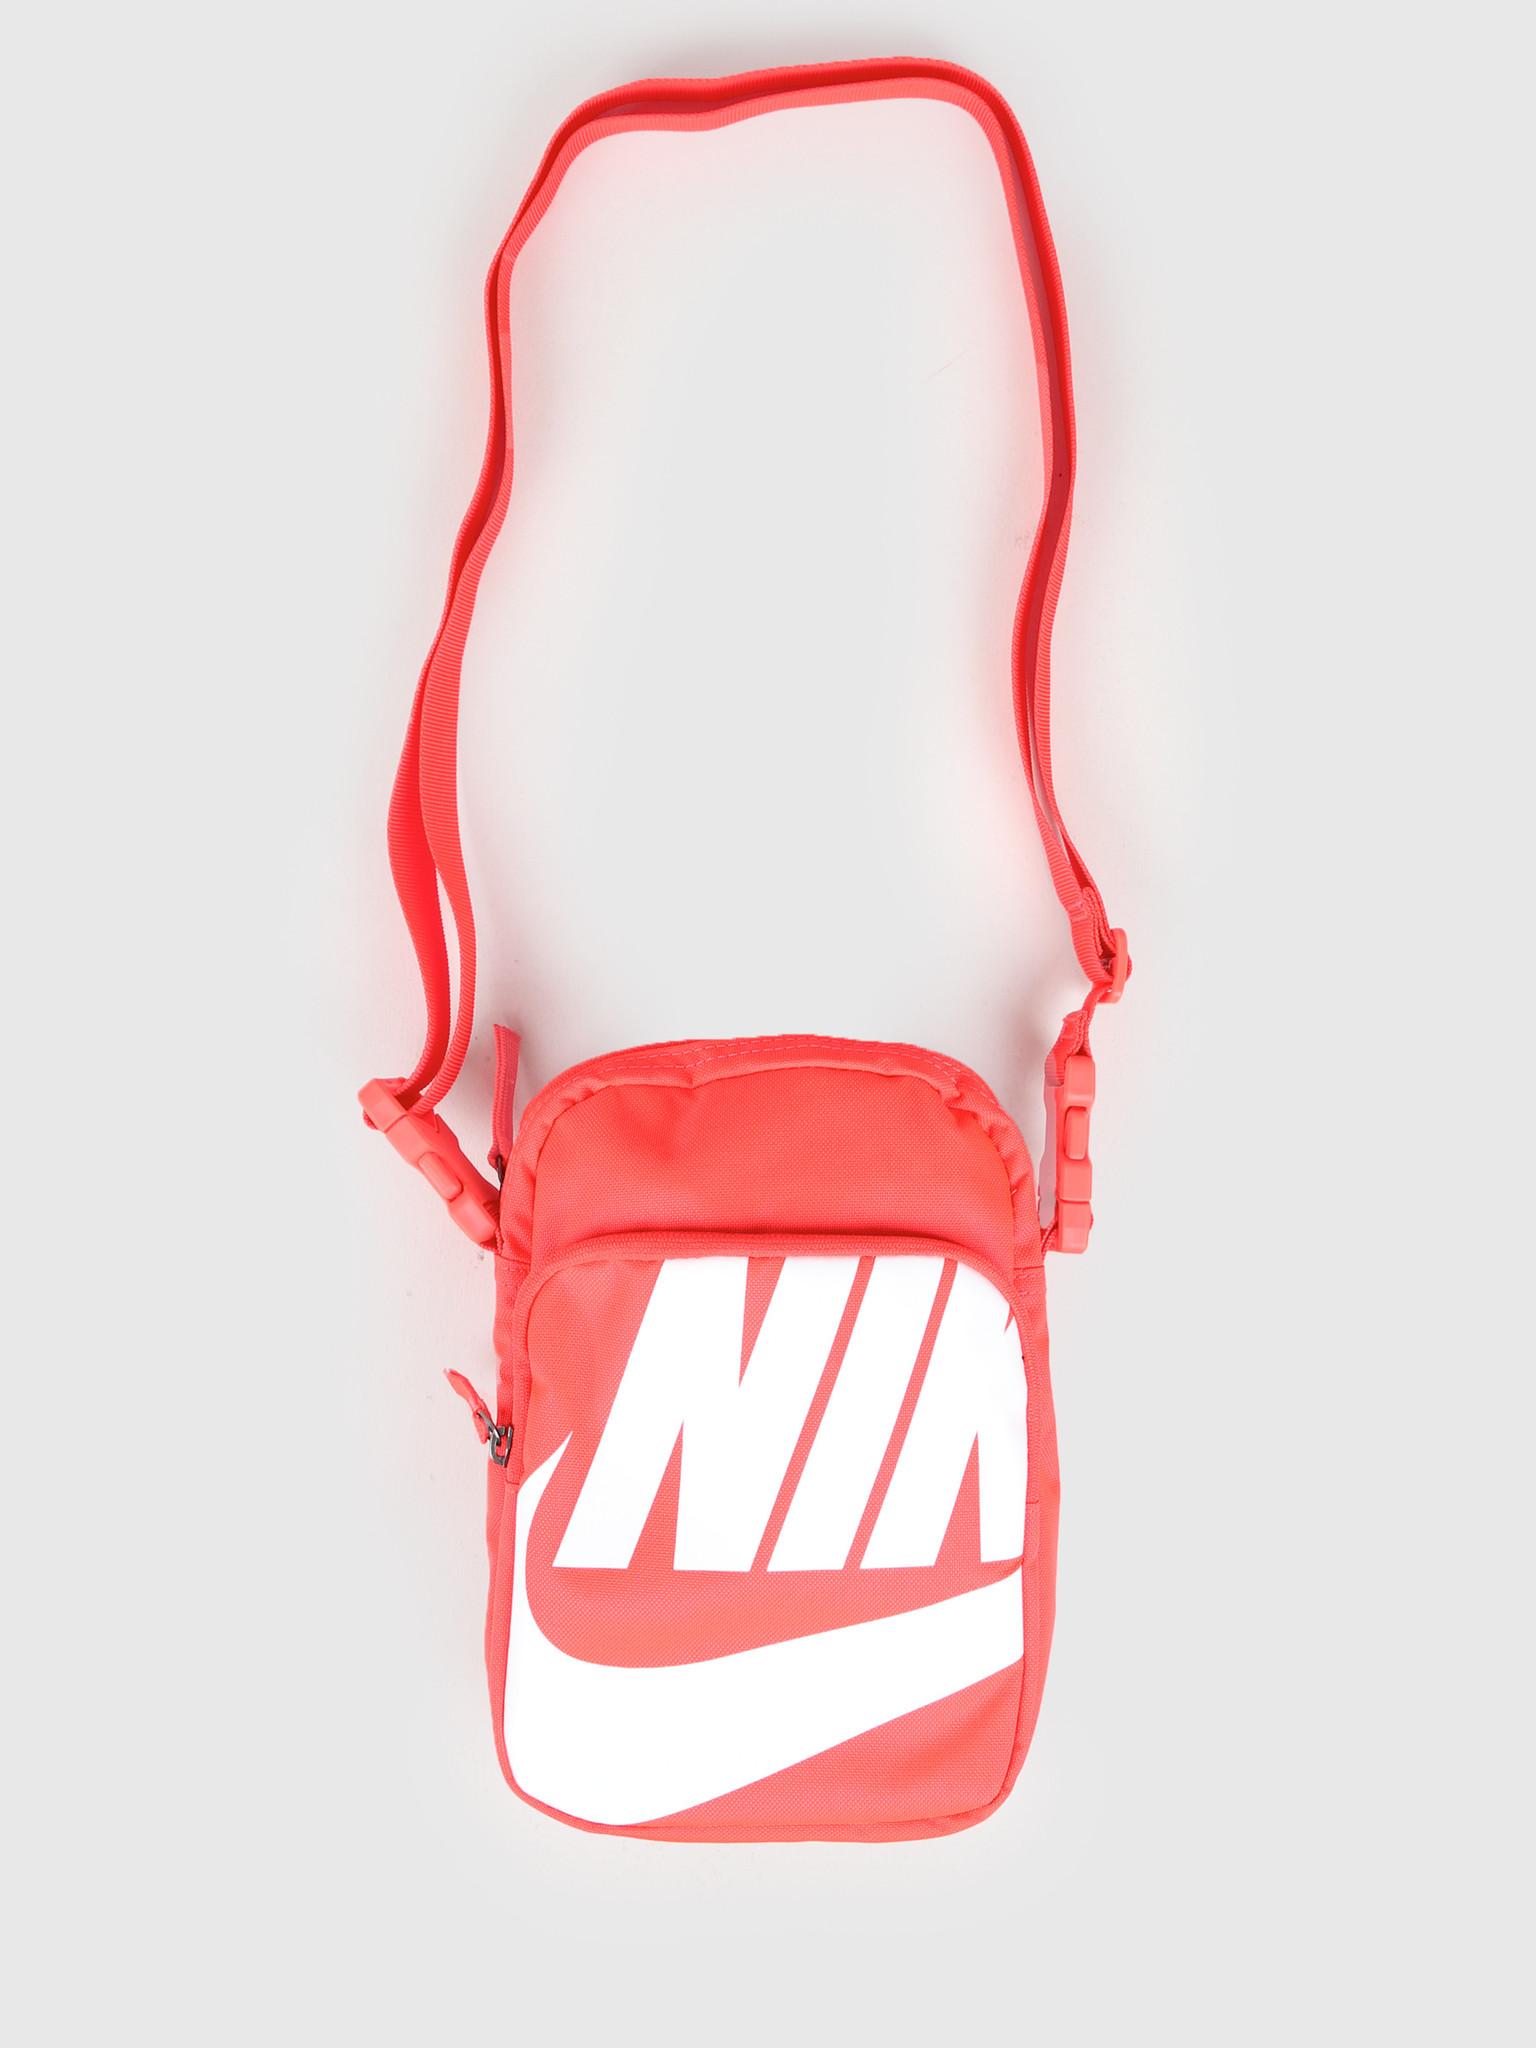 Nike Nike Heritage Sit 20 Gfx Bright Crison Bright Crison White BA6344-671